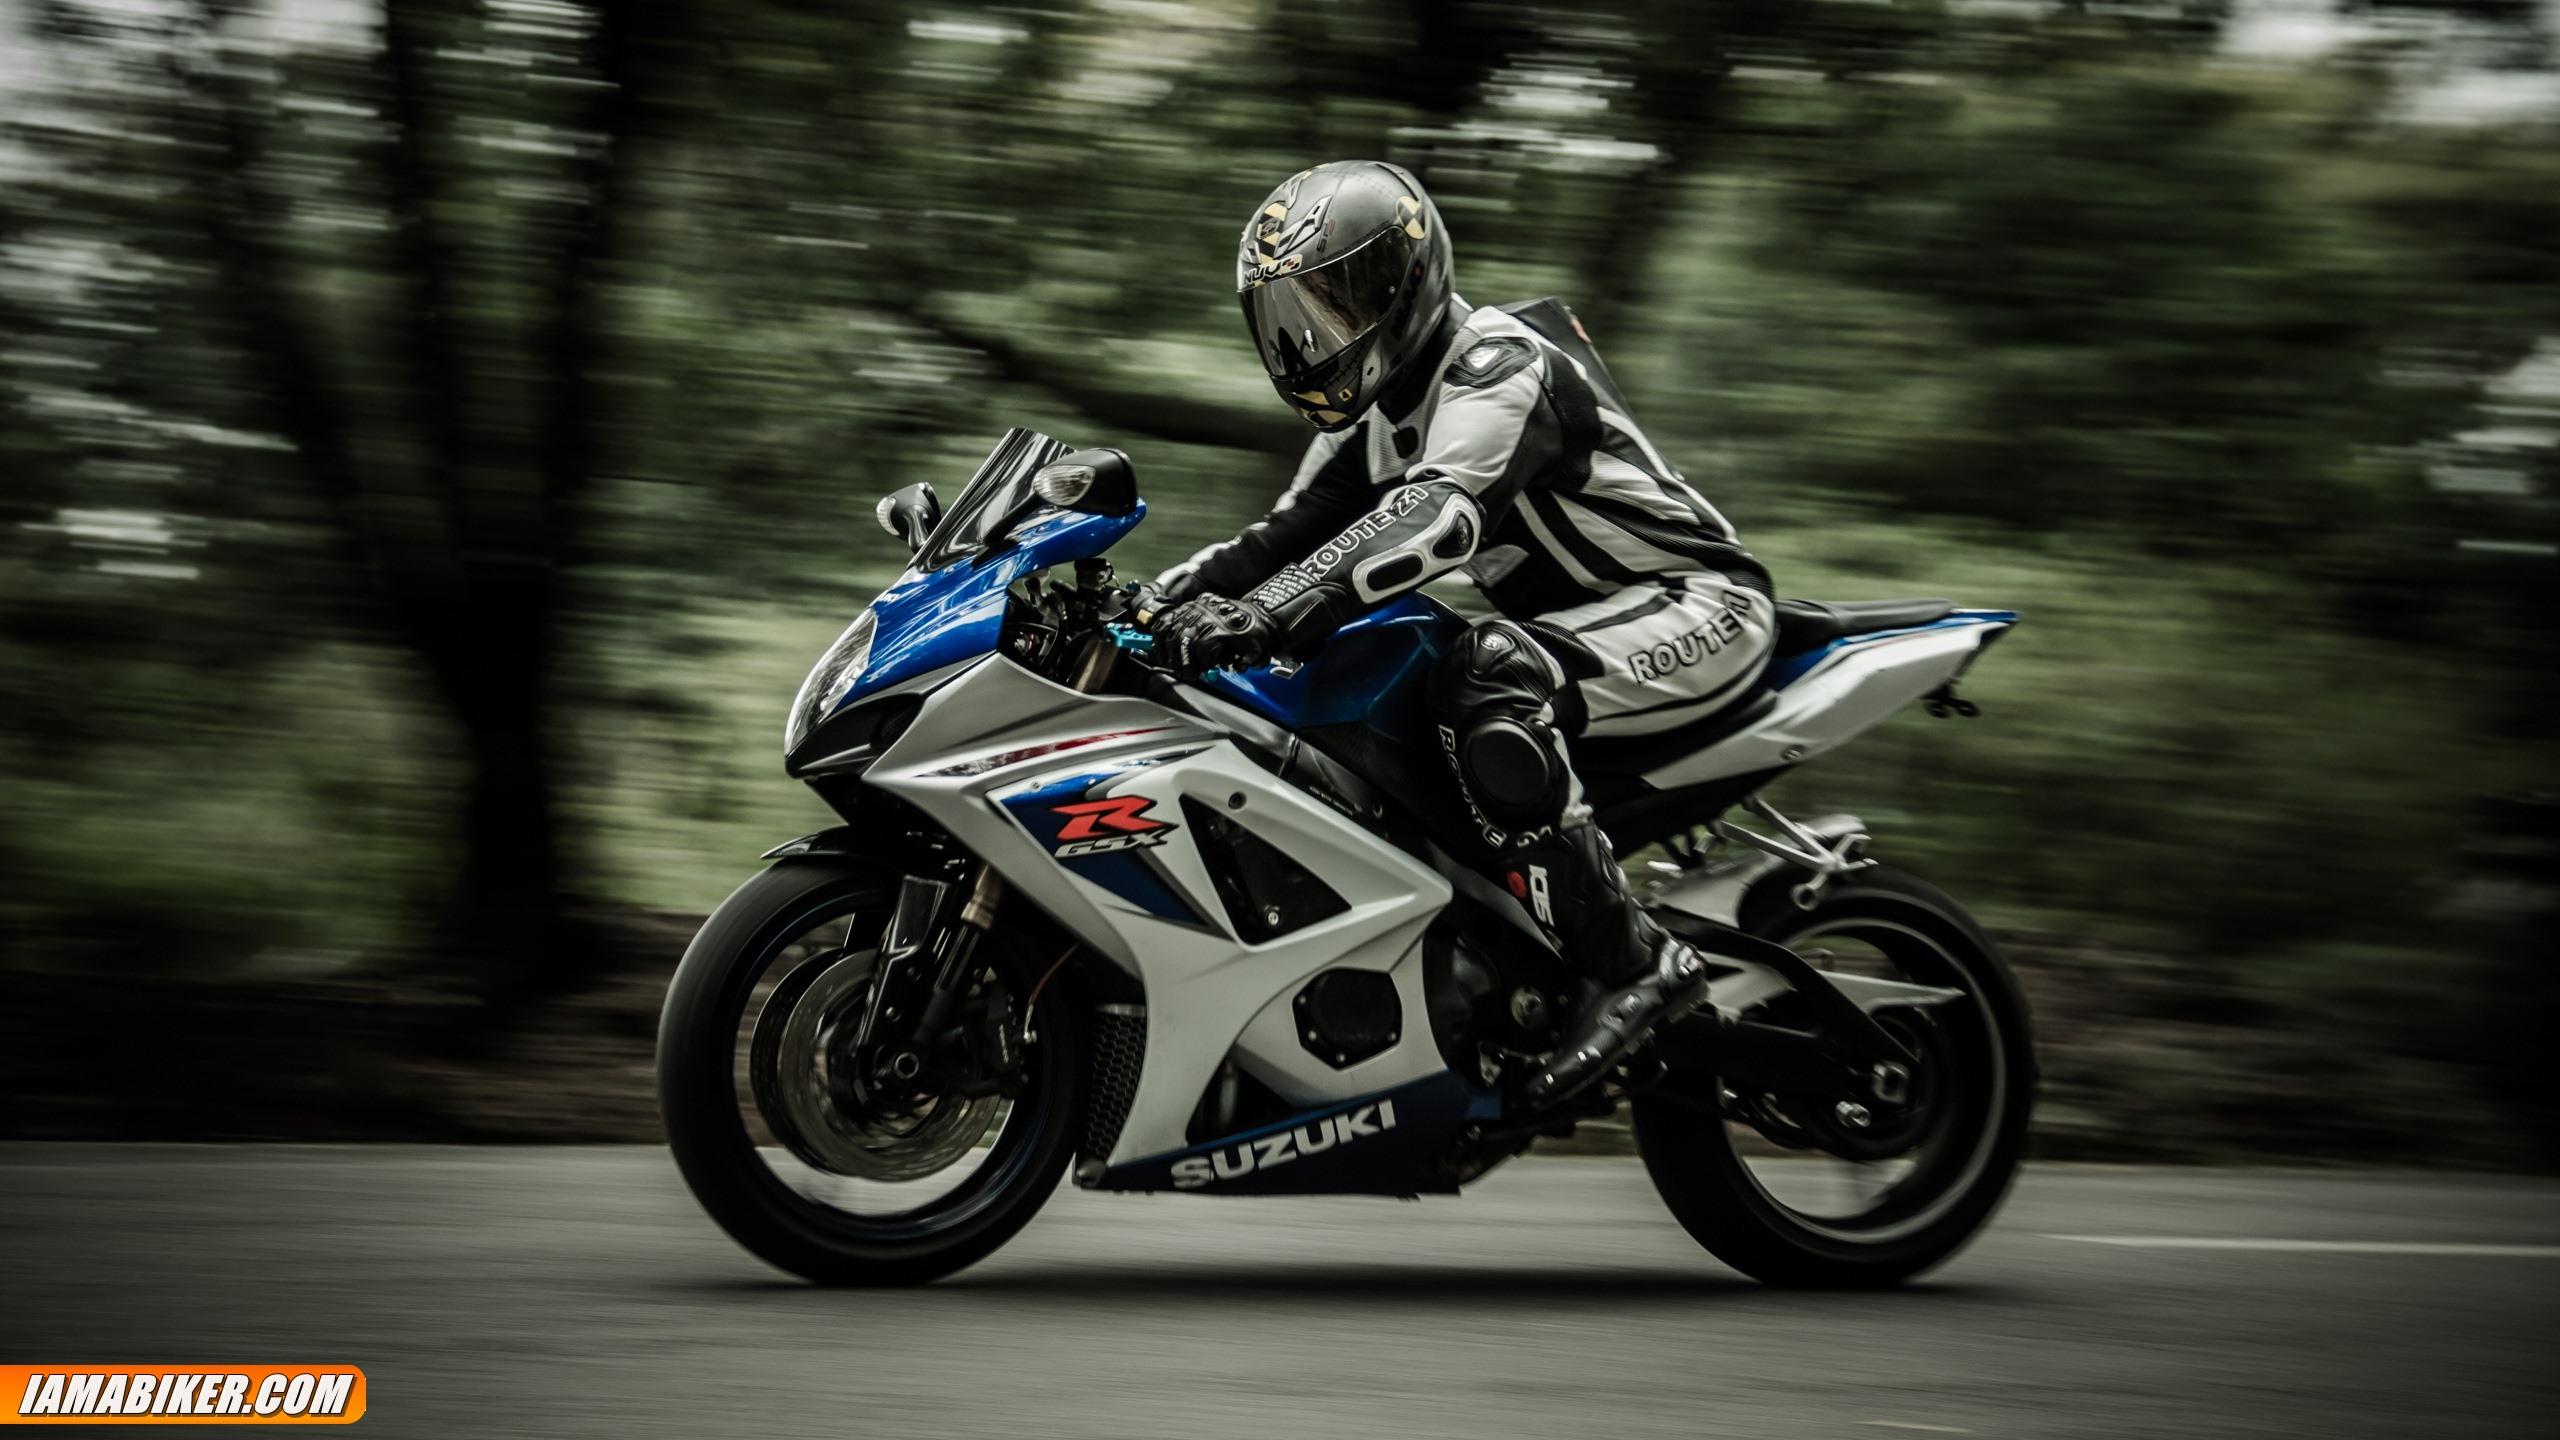 Suzuki moto  № 1582108 загрузить